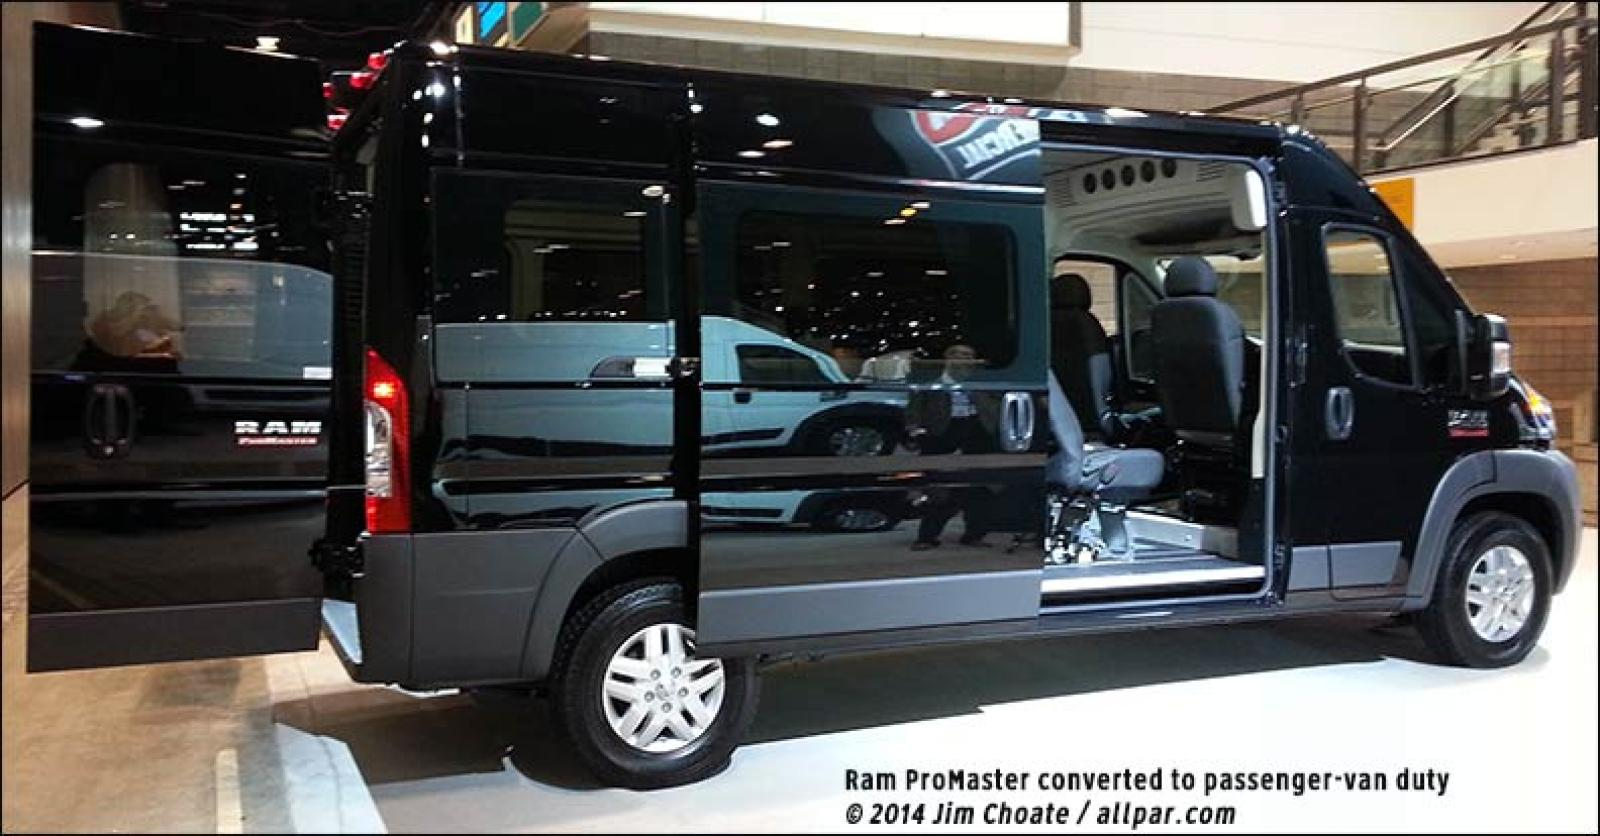 2015 ram promaster window van information and photos zombiedrive. Black Bedroom Furniture Sets. Home Design Ideas